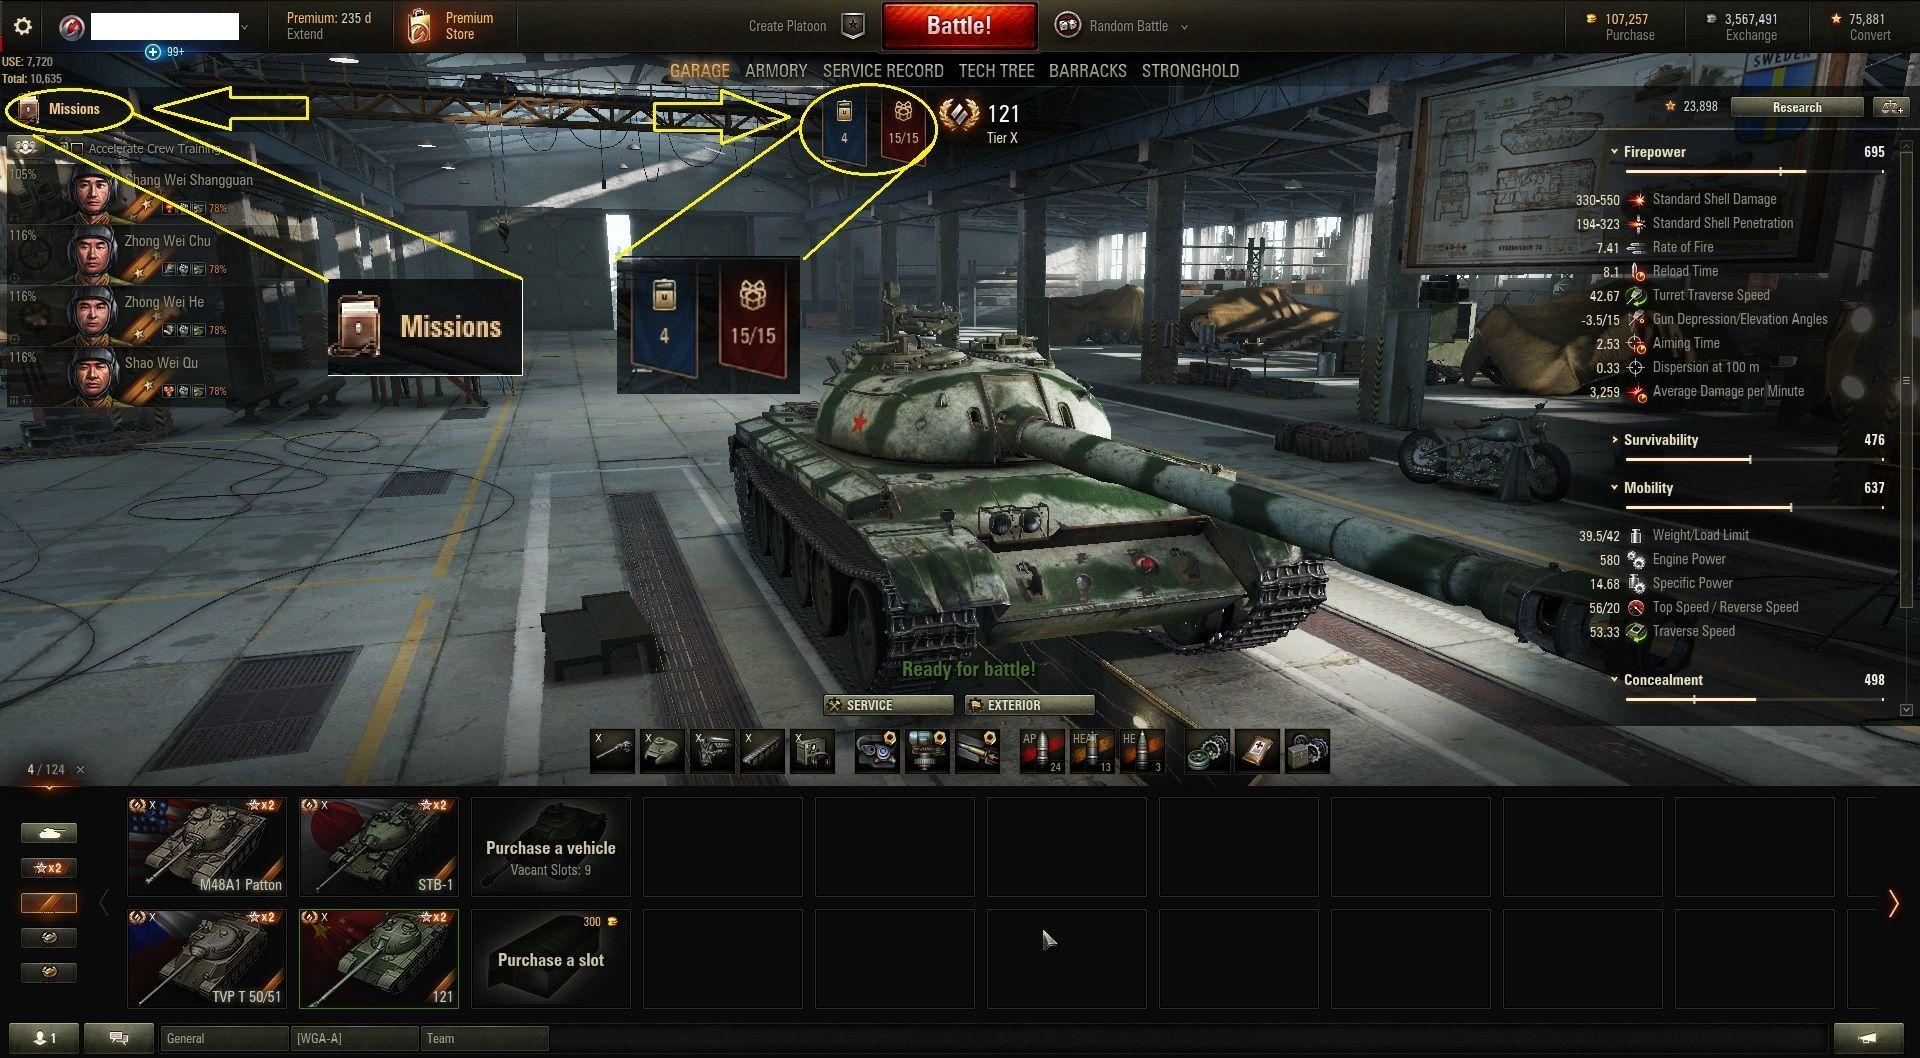 pc gamer world of tanks code